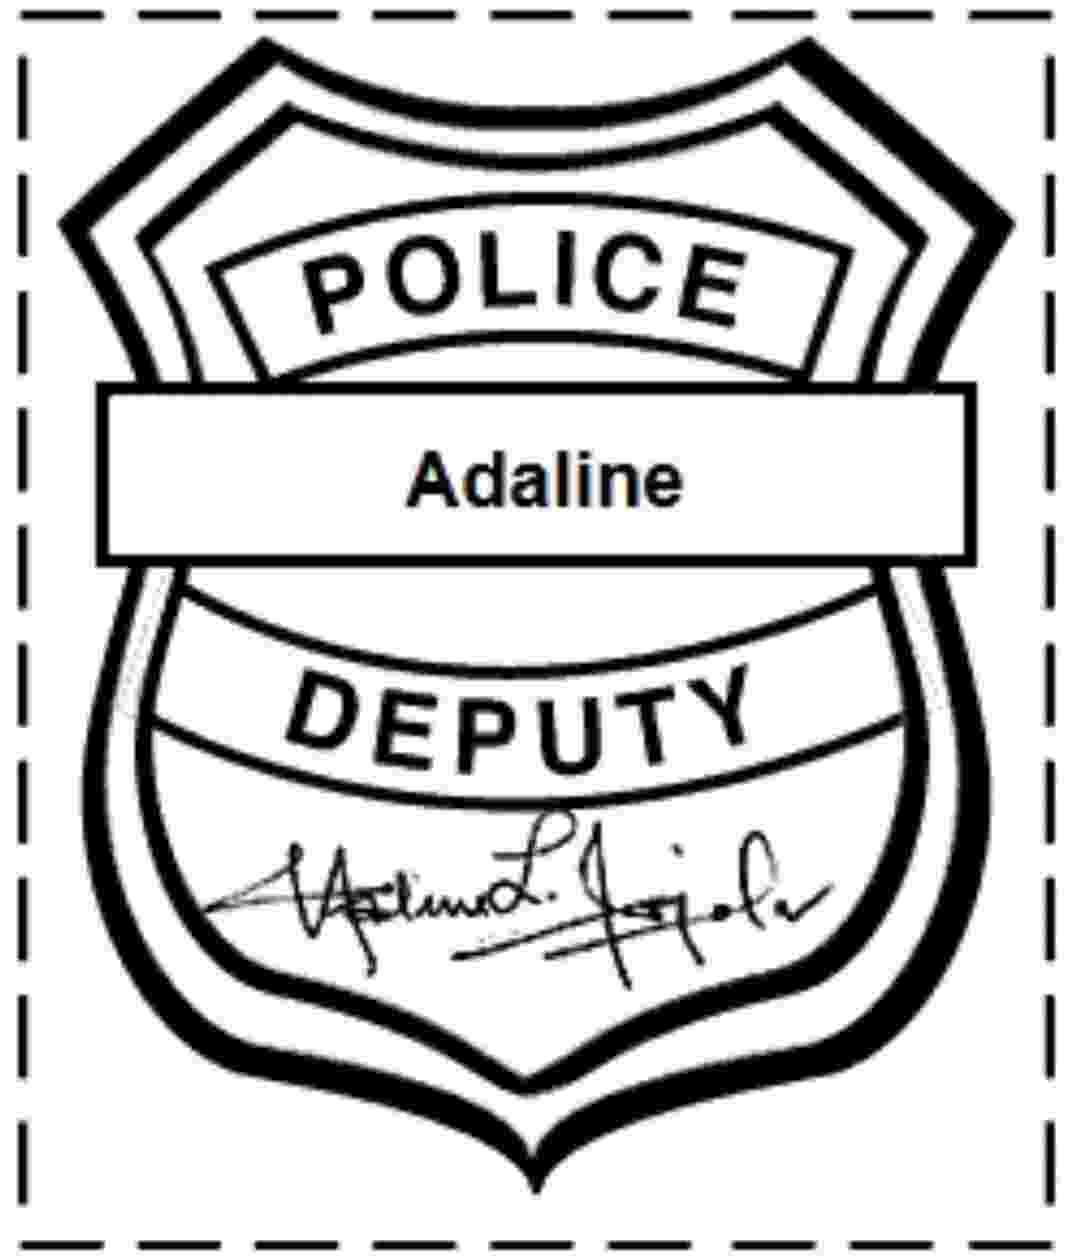 free printable police badge template free printable police badge template free download best police free badge template printable